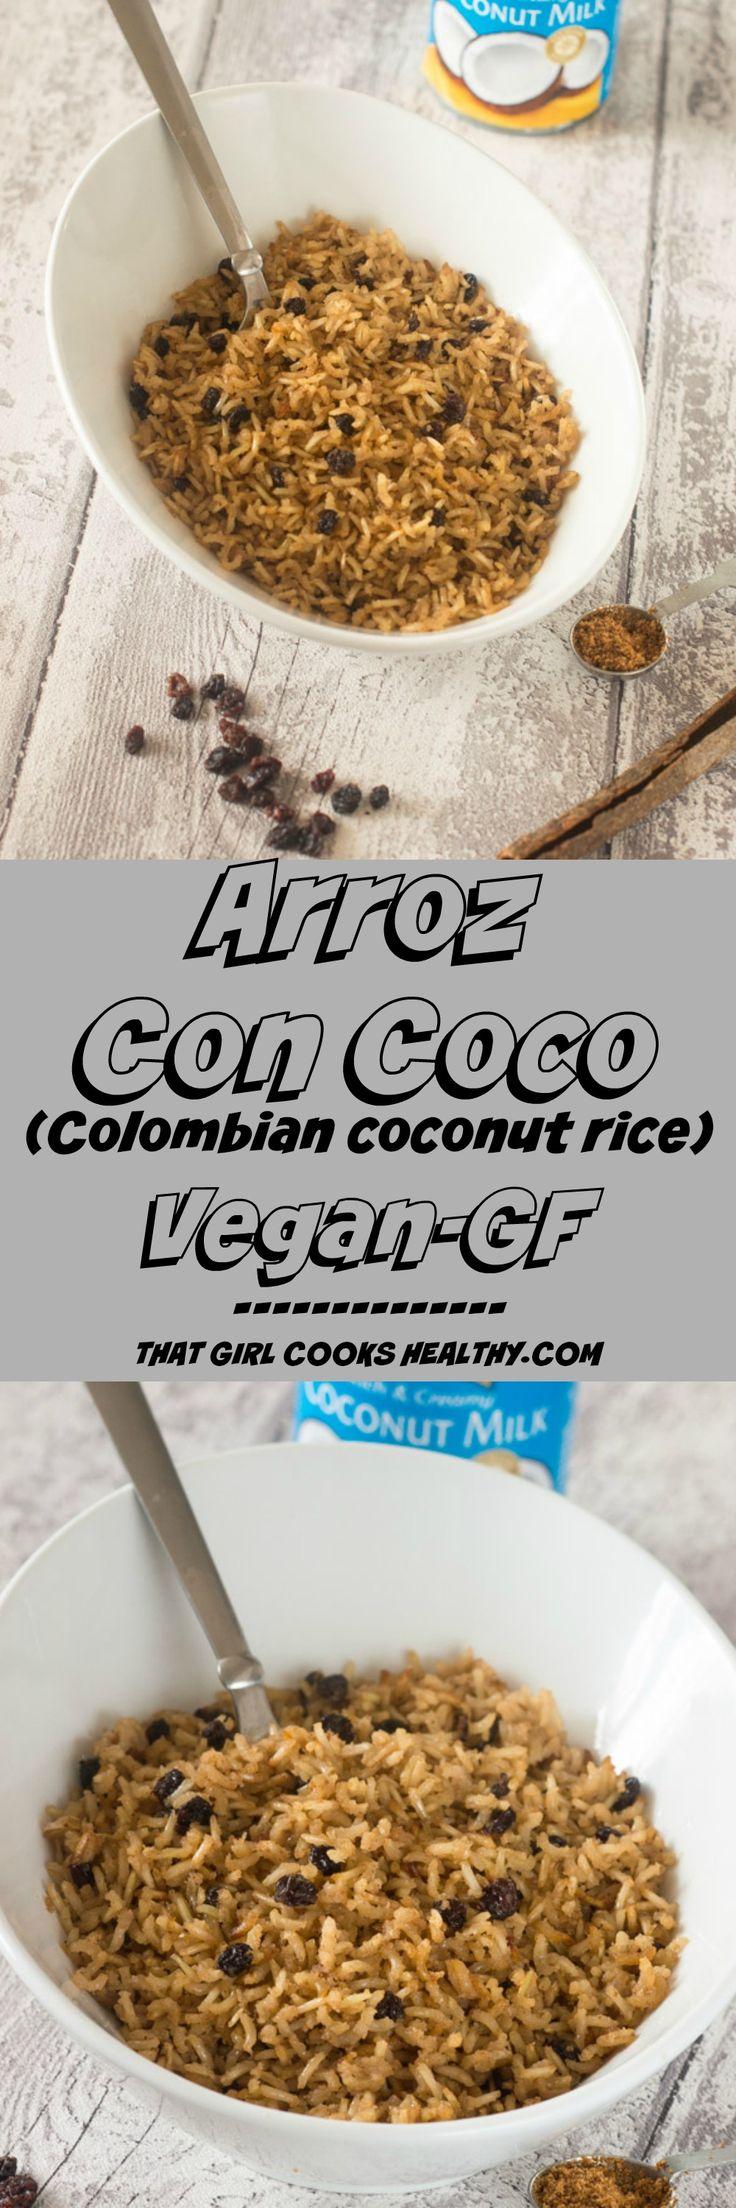 Arroz-con-coco - colombian coconut rice (vegan and gluten free)